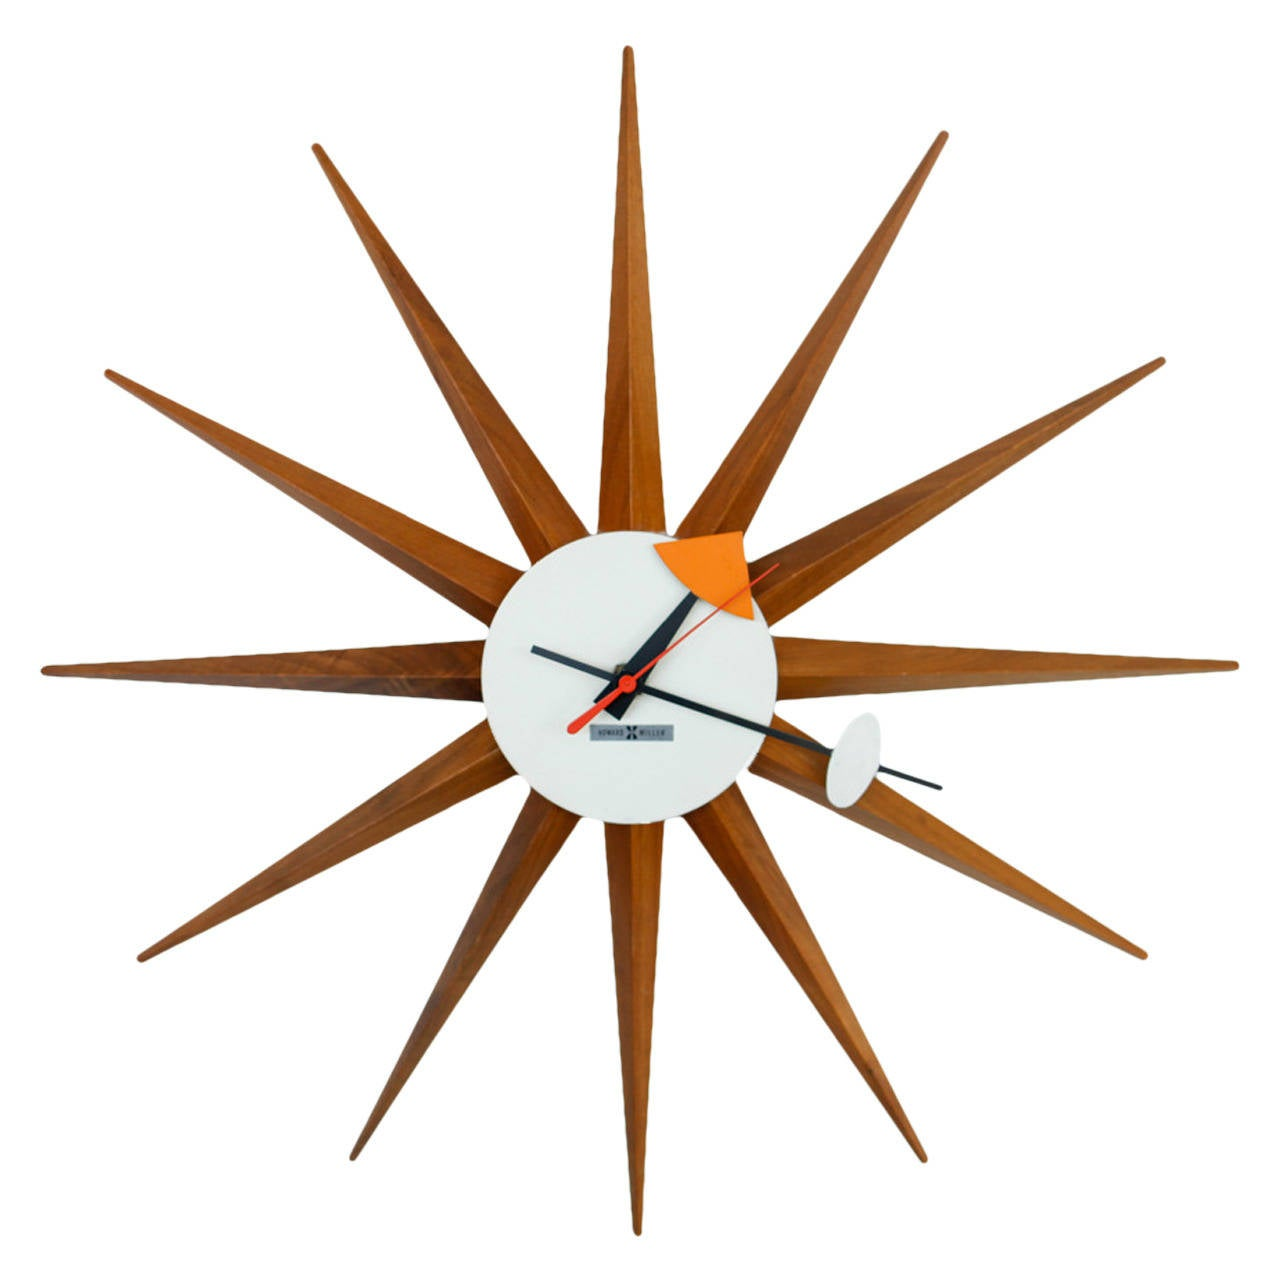 george nelson howard miller starburst wall clock at stdibs - george nelson howard miller starburst wall clock